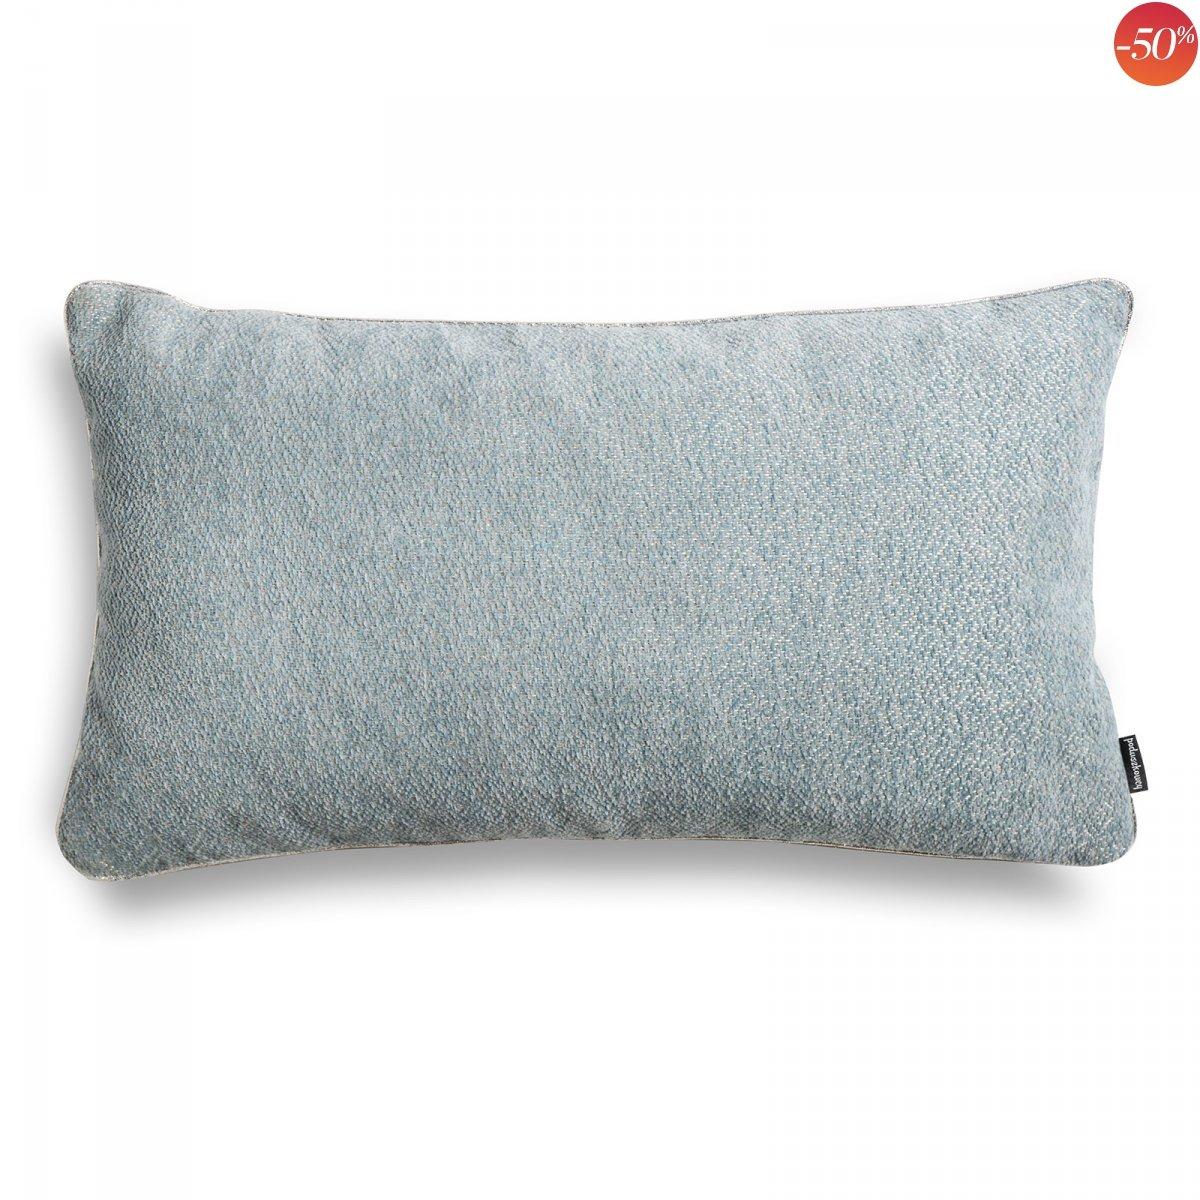 Alaska błękitna błyszcząca poduszka dekoracyjna 50x30